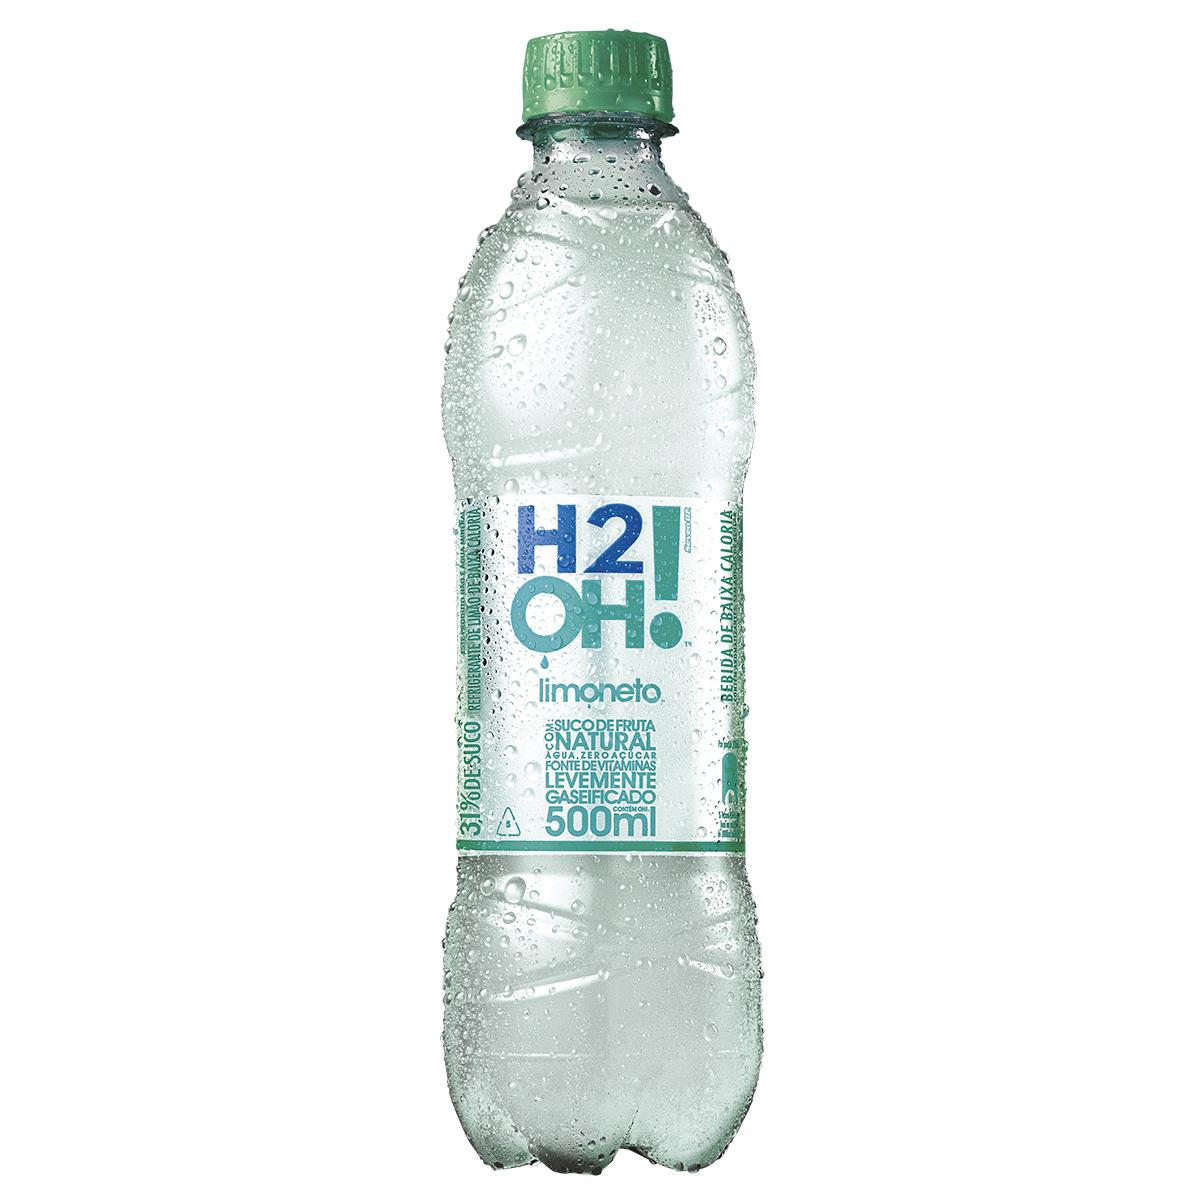 H2OH LIMONETO 500ML X12